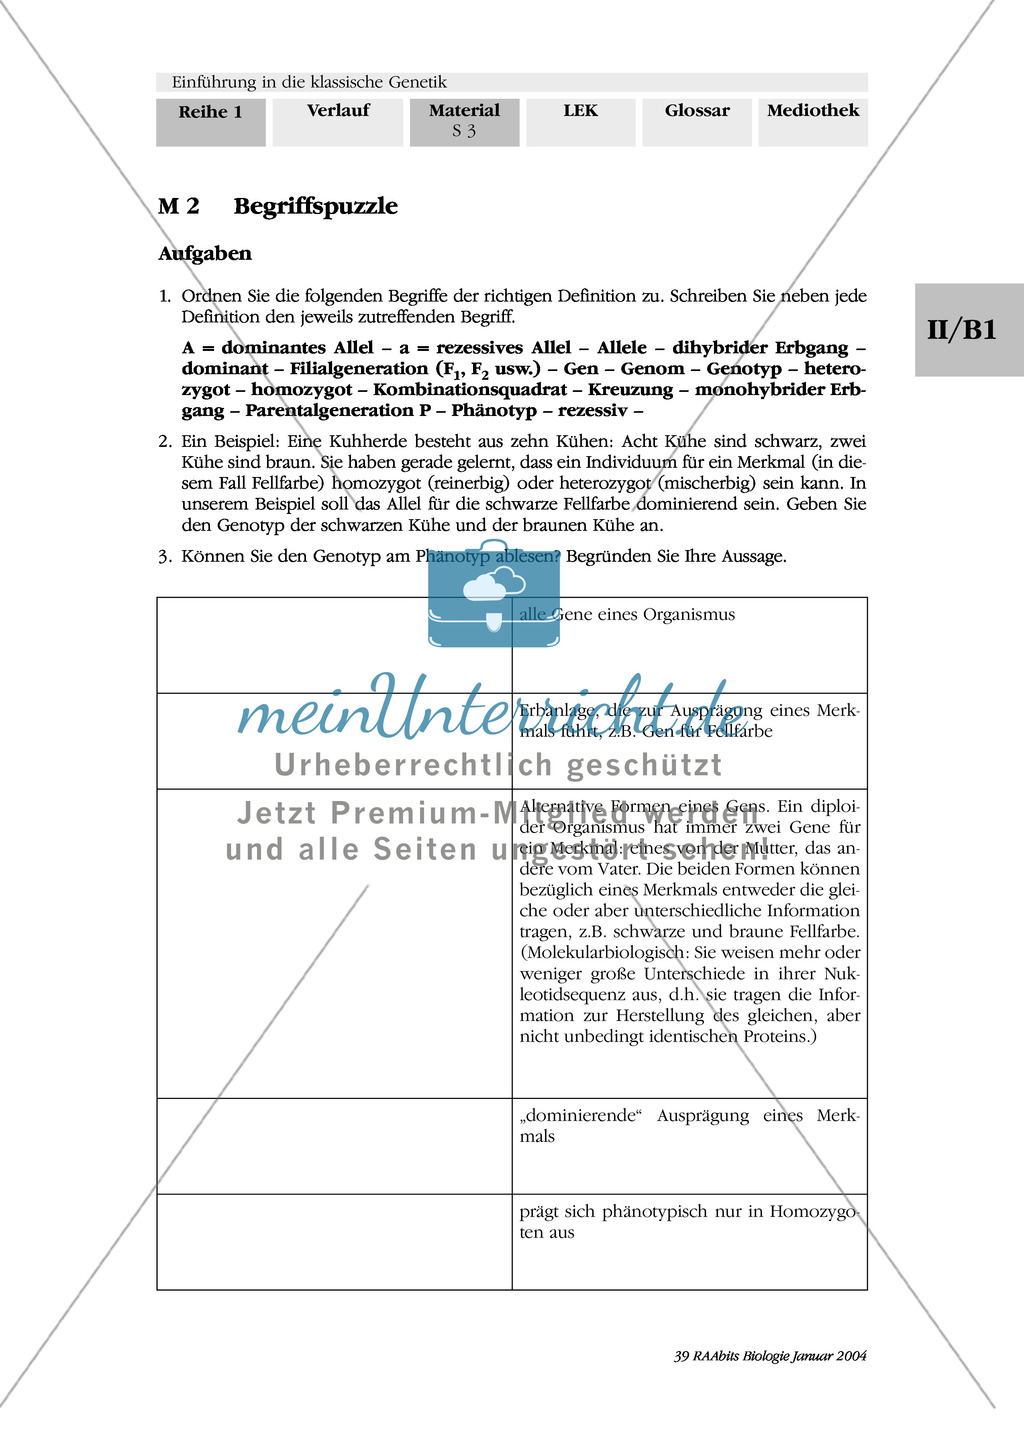 Klassische Genetik: Mendel`sche Regeln - Begriffe, Regeln, Kodominanz Preview 0